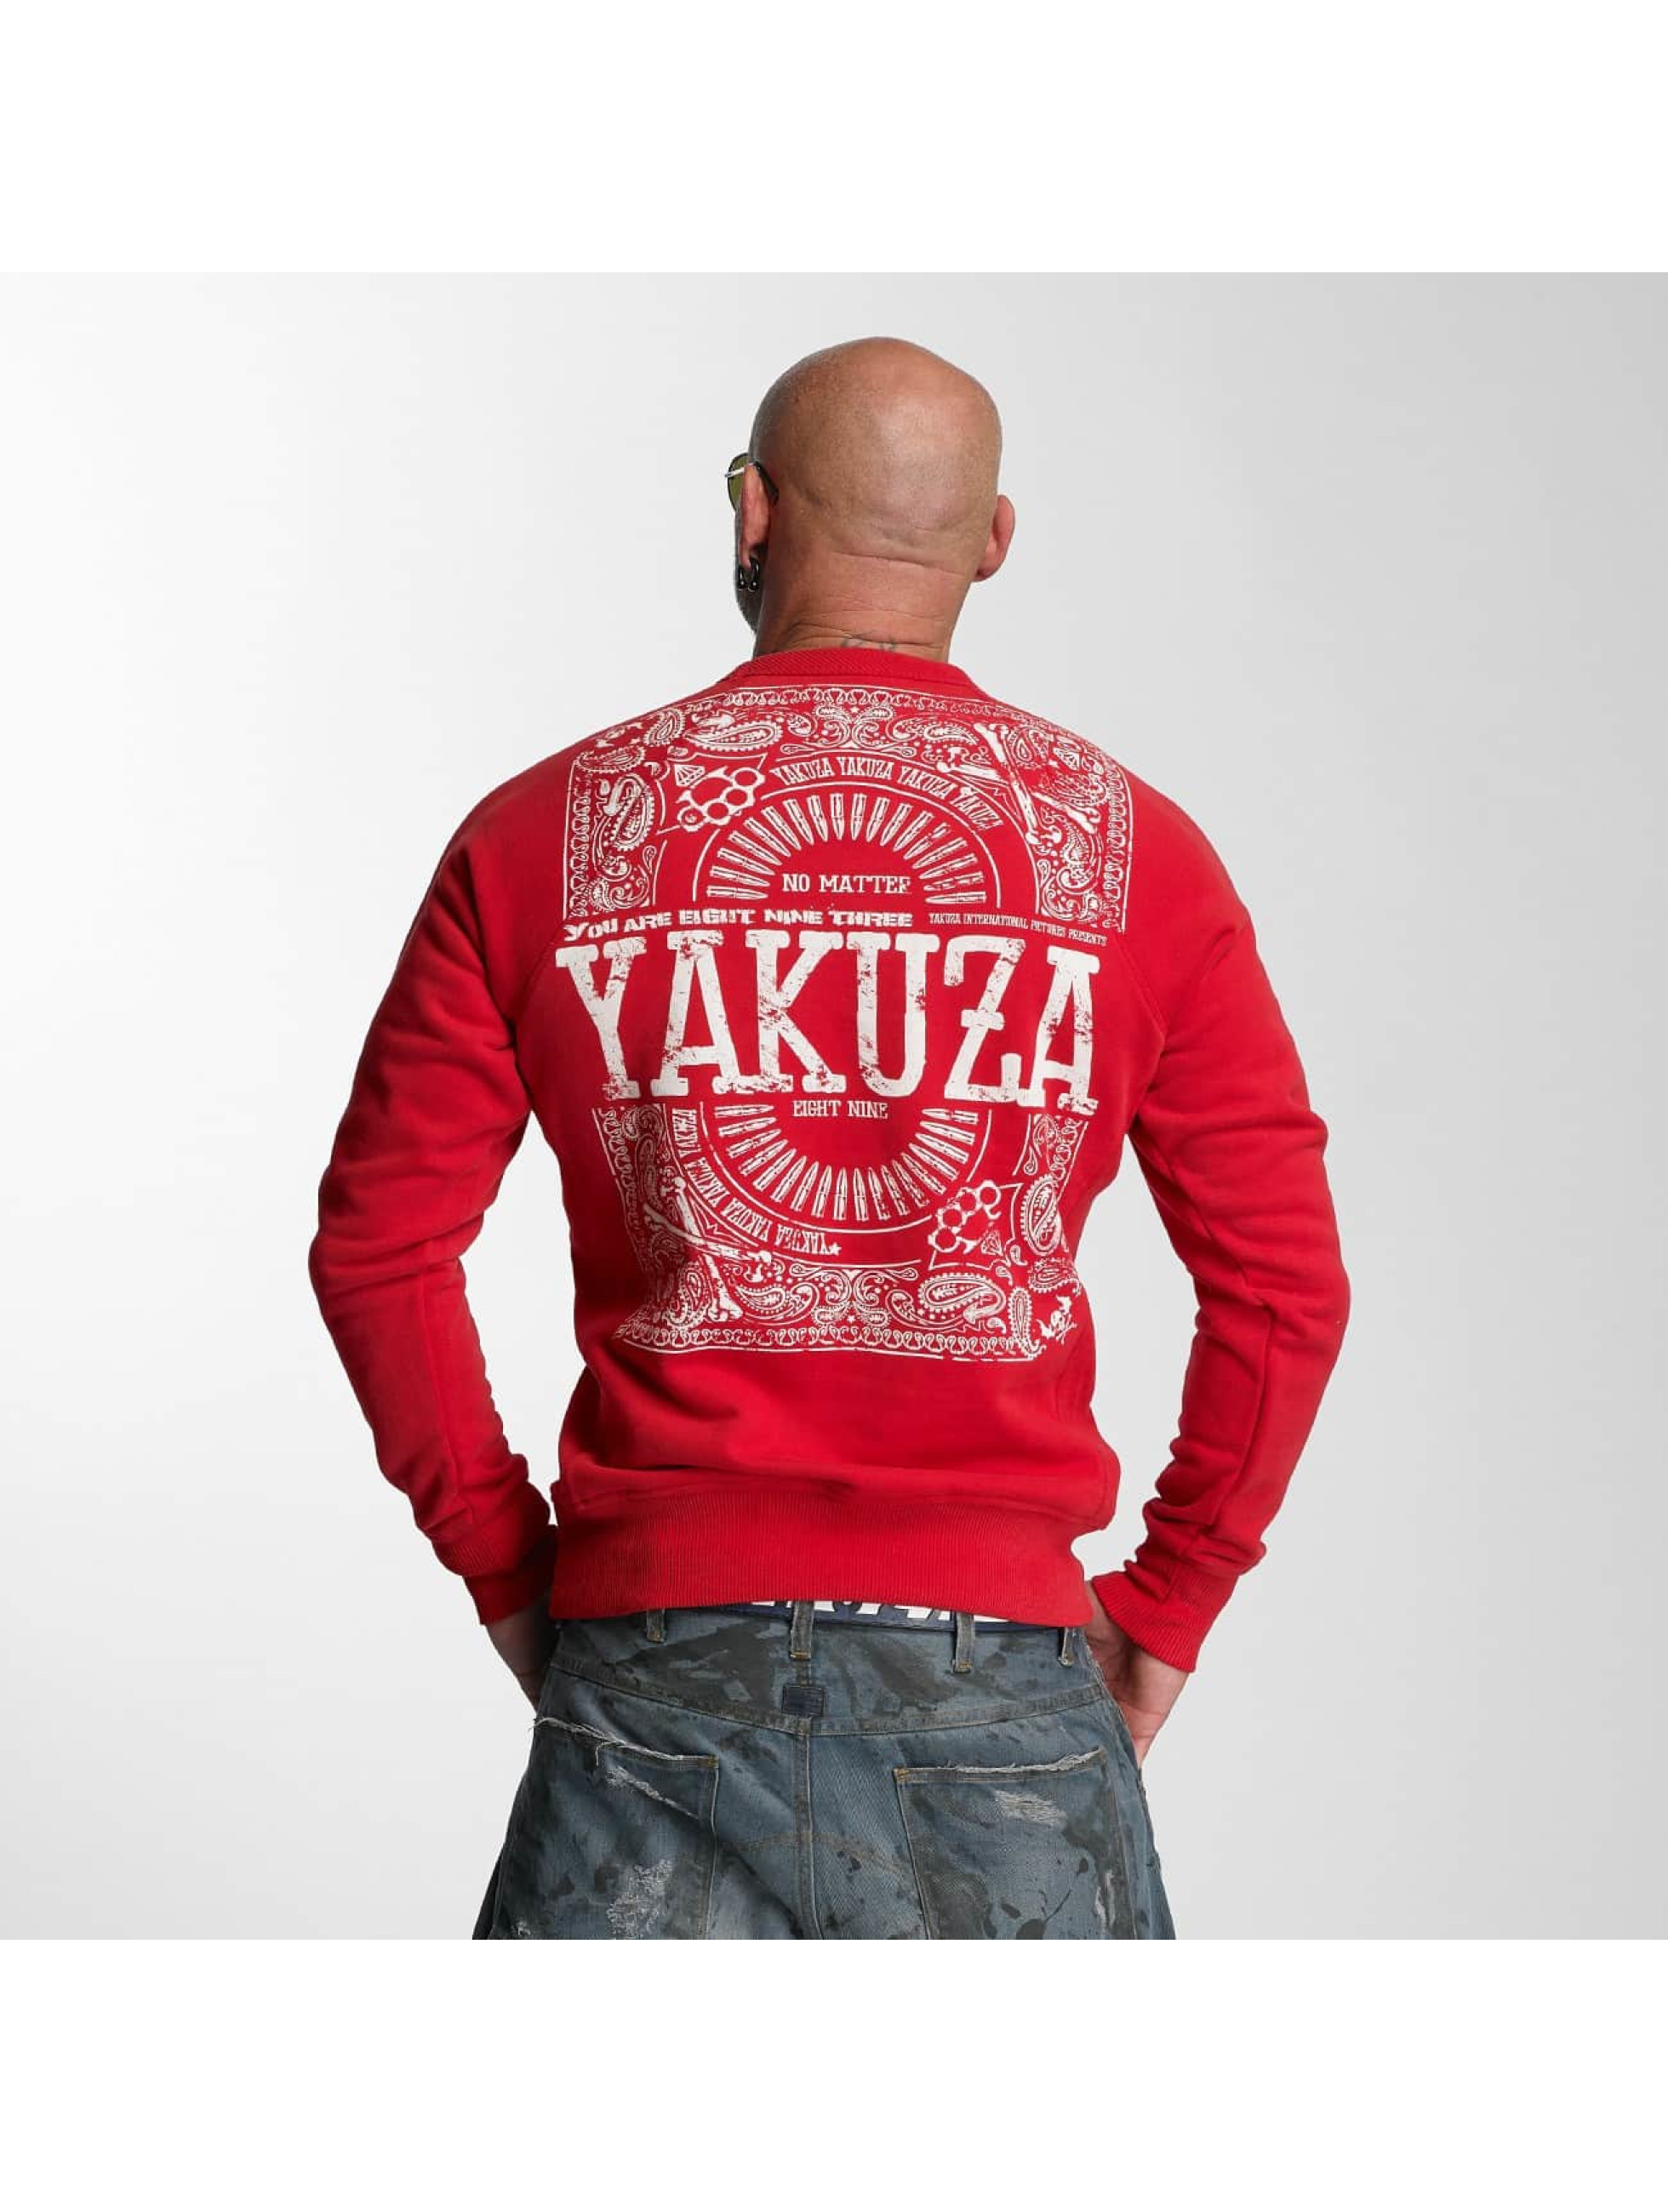 Yakuza Gensre No Matter red